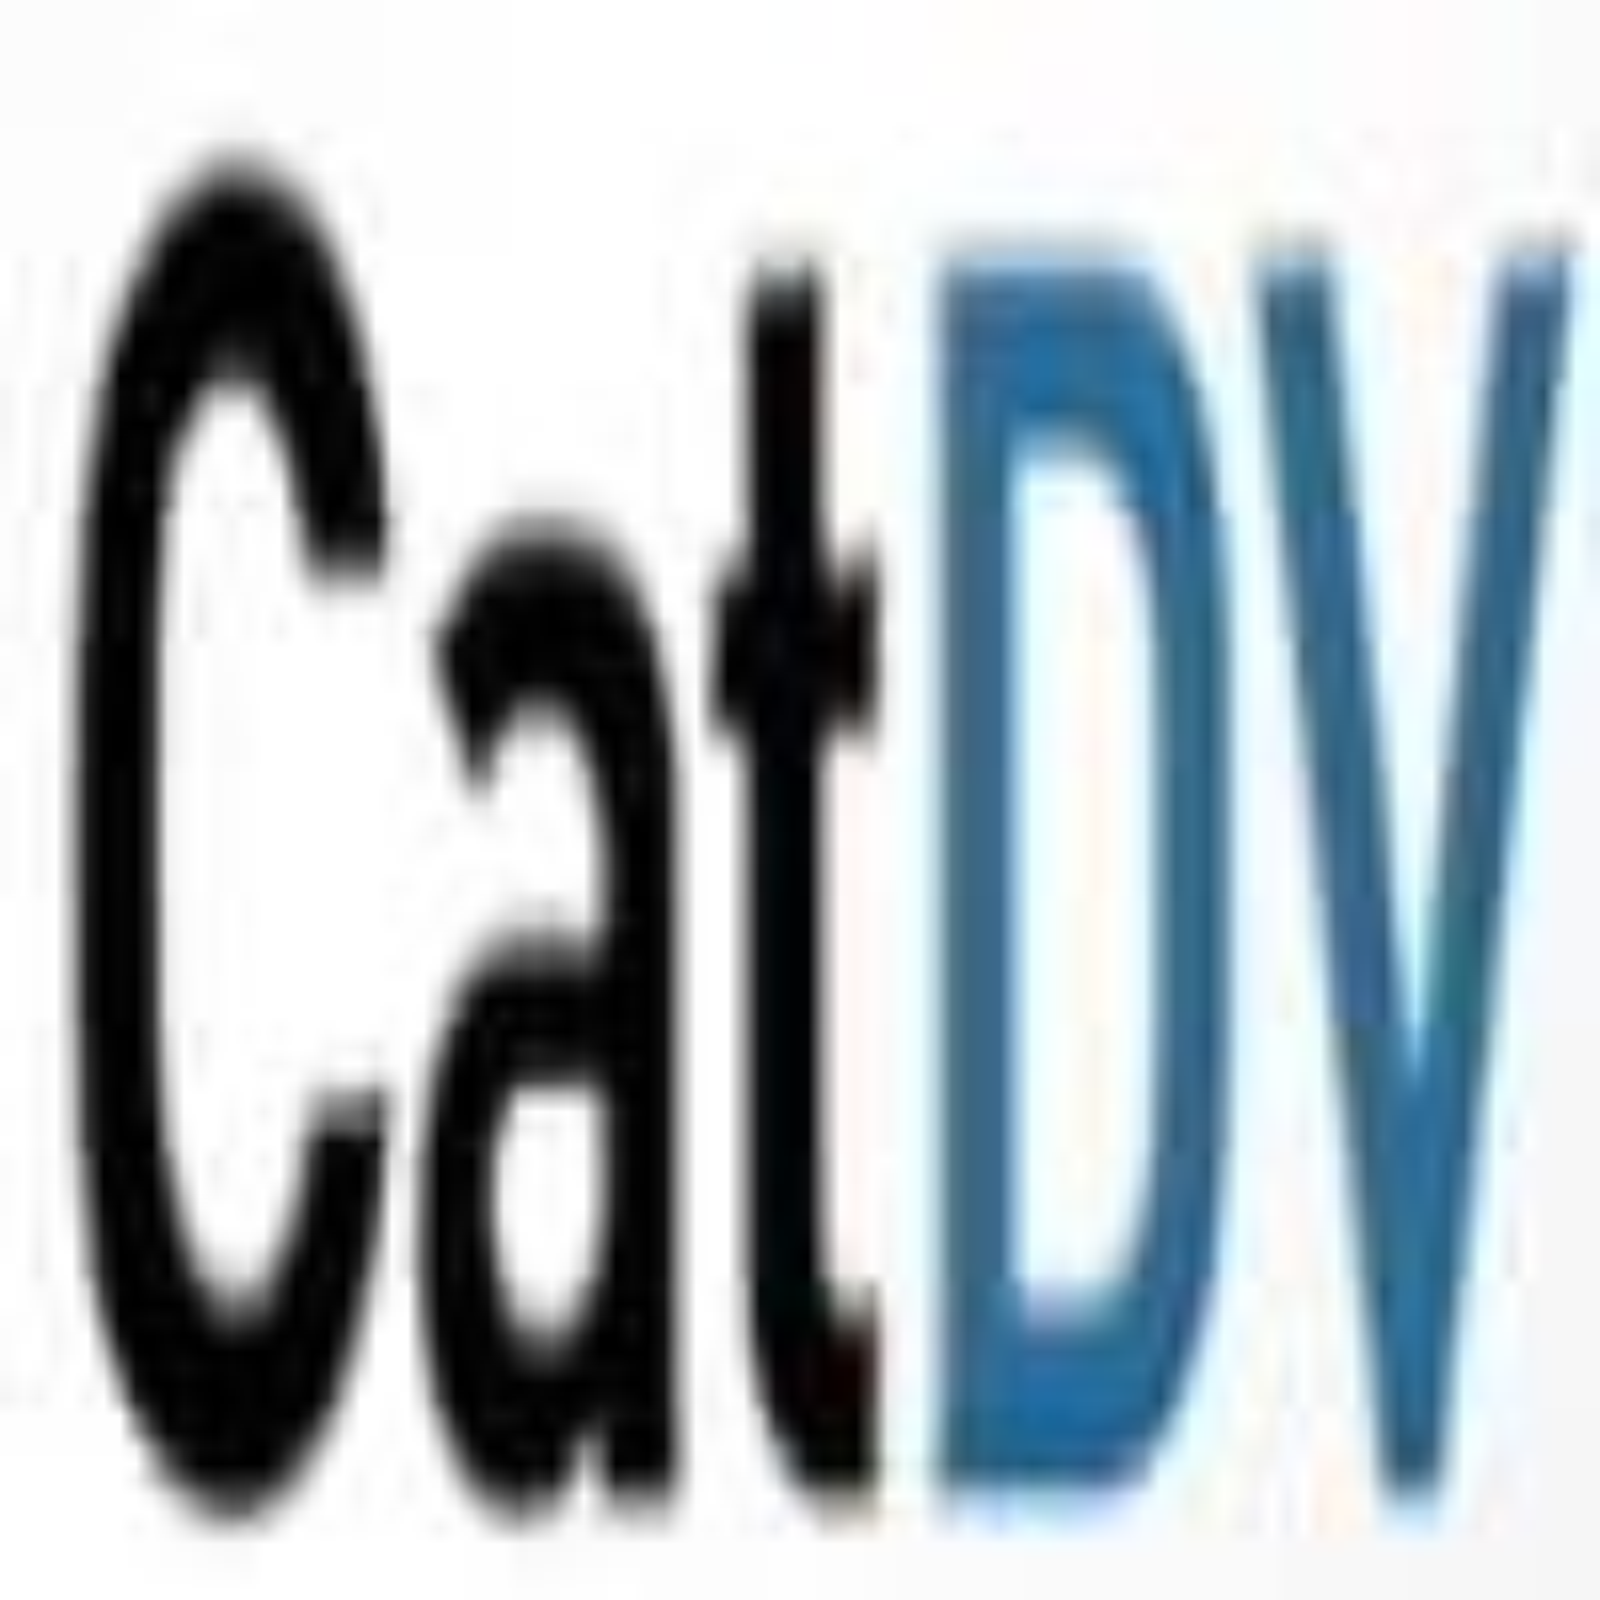 CatDV Standard 8.1.11